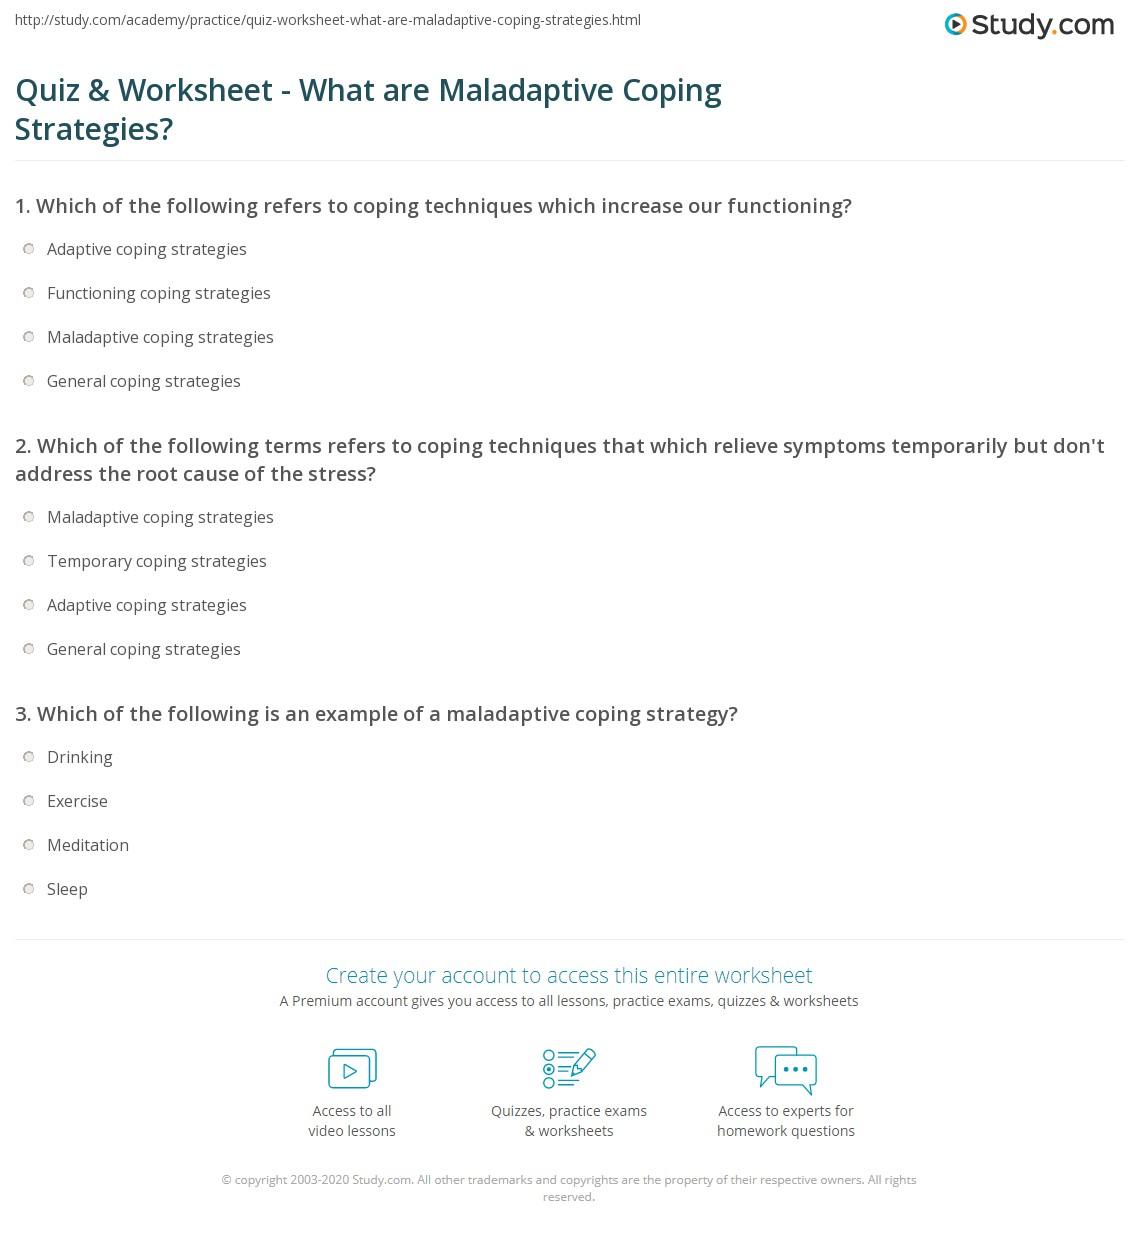 Quiz & Worksheet - What are Maladaptive Coping Strategies? | Study.com